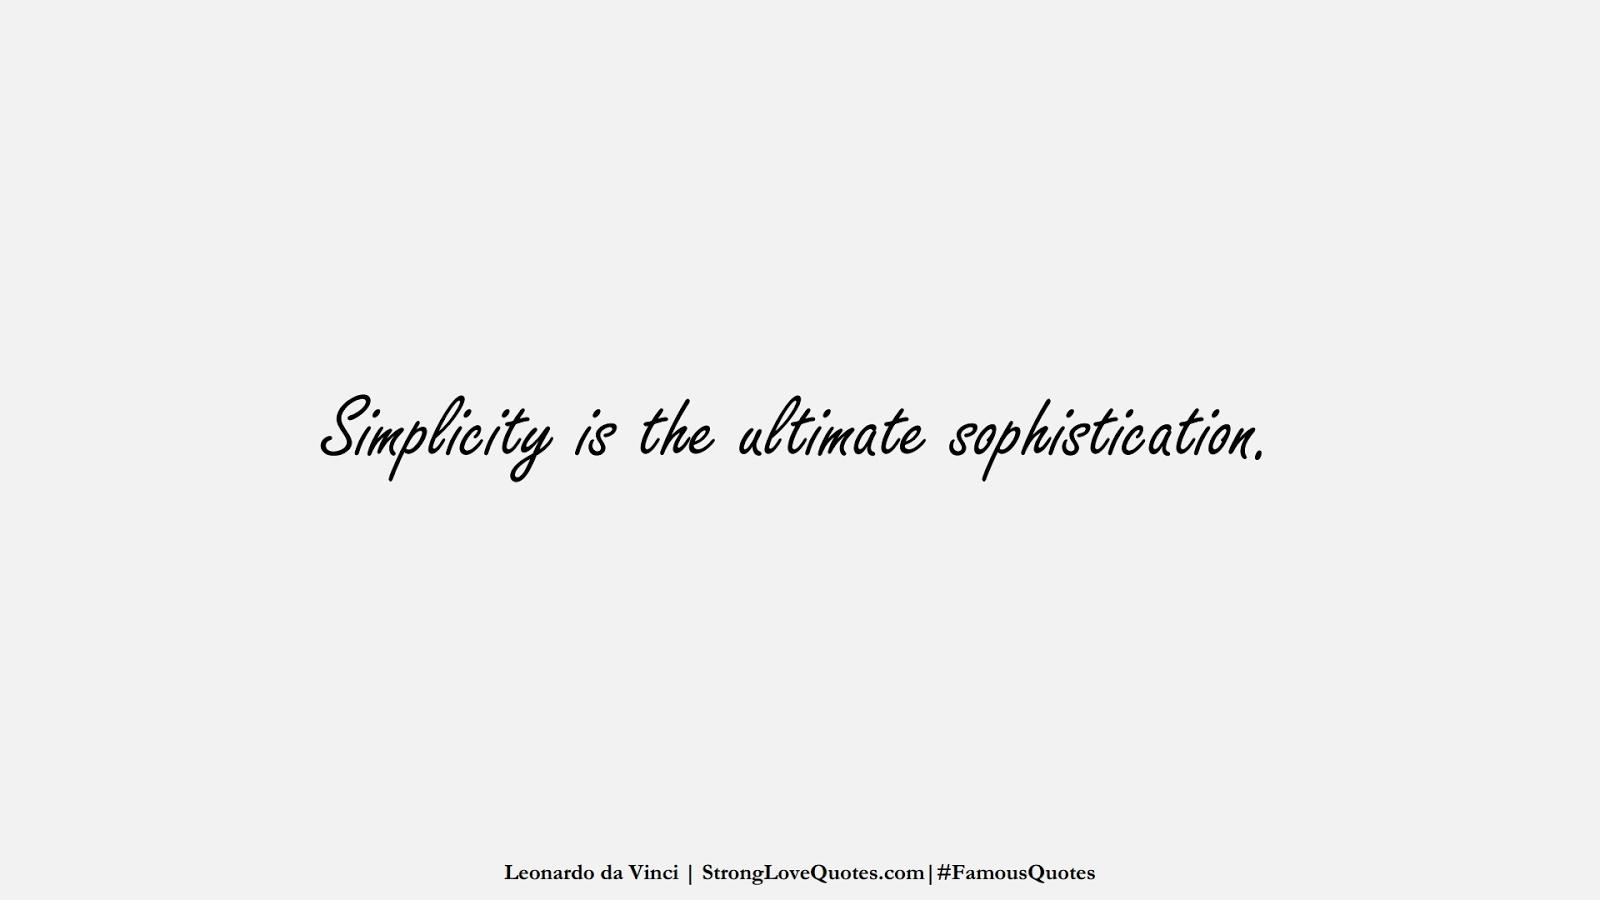 Simplicity is the ultimate sophistication. (Leonardo da Vinci);  #FamousQuotes